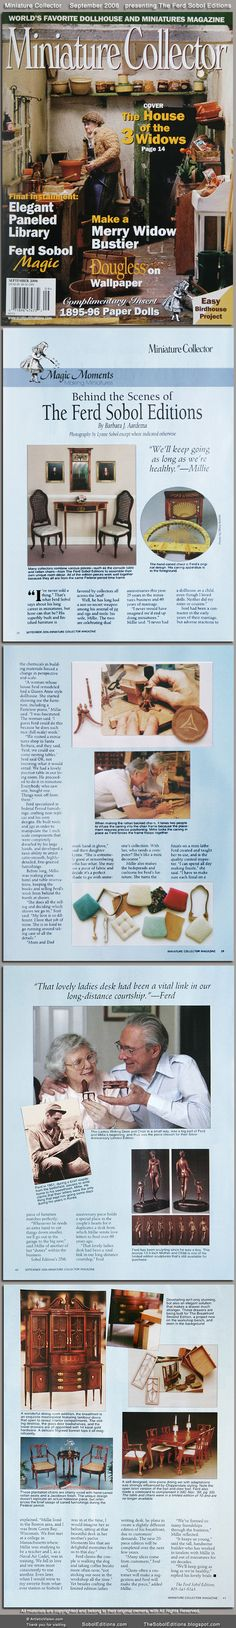 Miniature Collector magazine - The Ferd Sobol Editions Visit the website: SobolEditions.com visit the blog: TheSobolEditions.blogspot.com